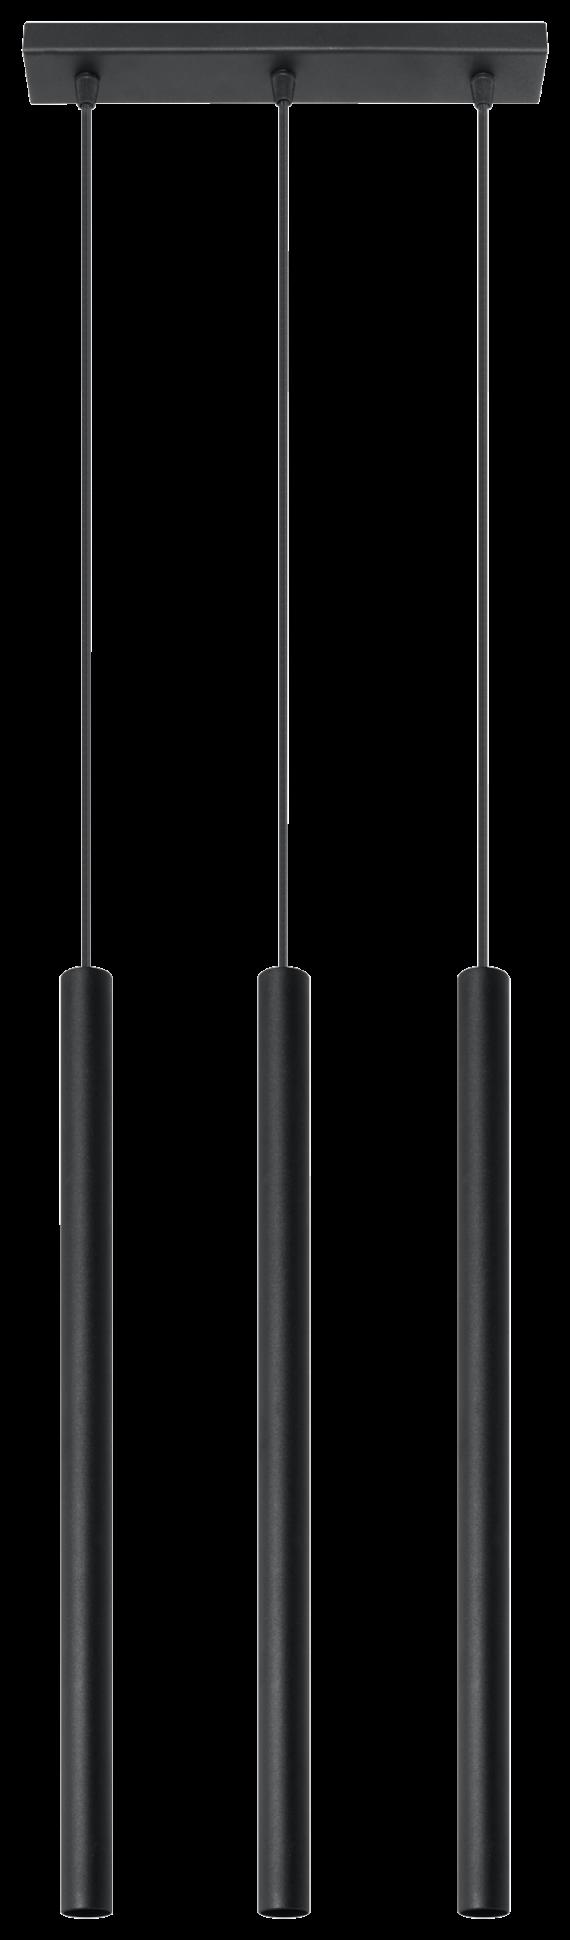 Designerska lampa wisząca Pastelo 3 punktowa 01 czarny